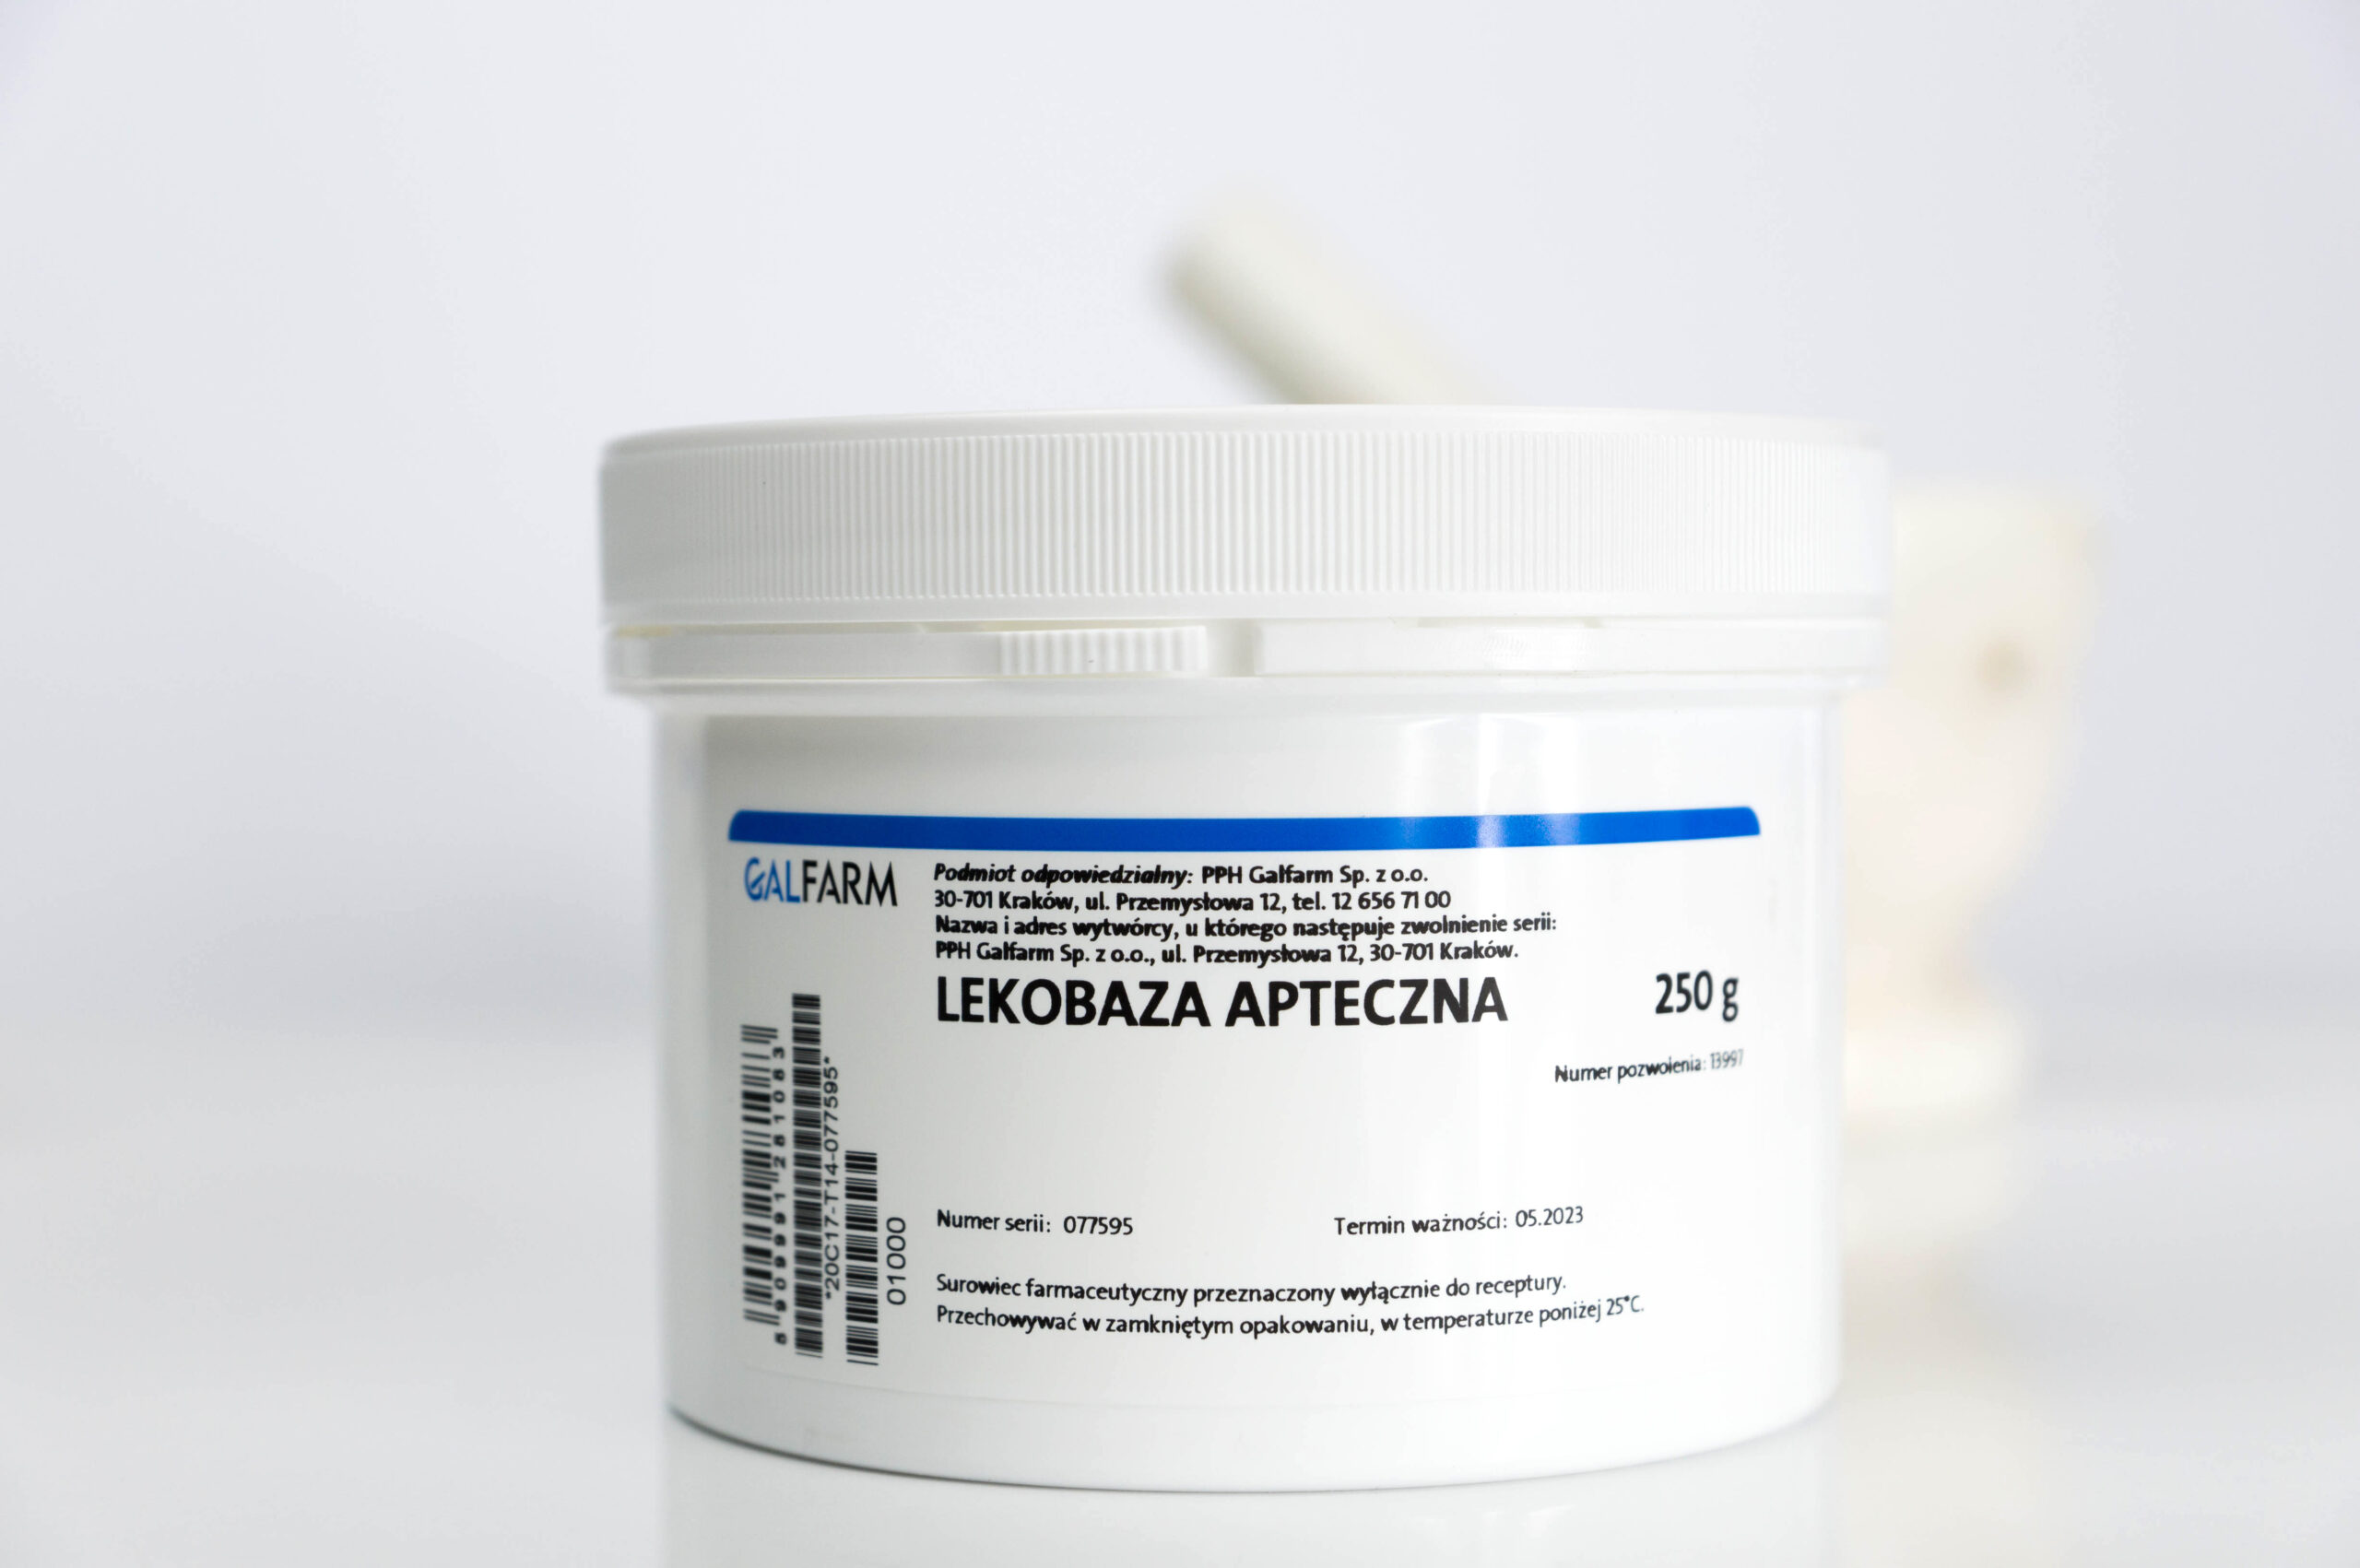 Lekobaza apteczna